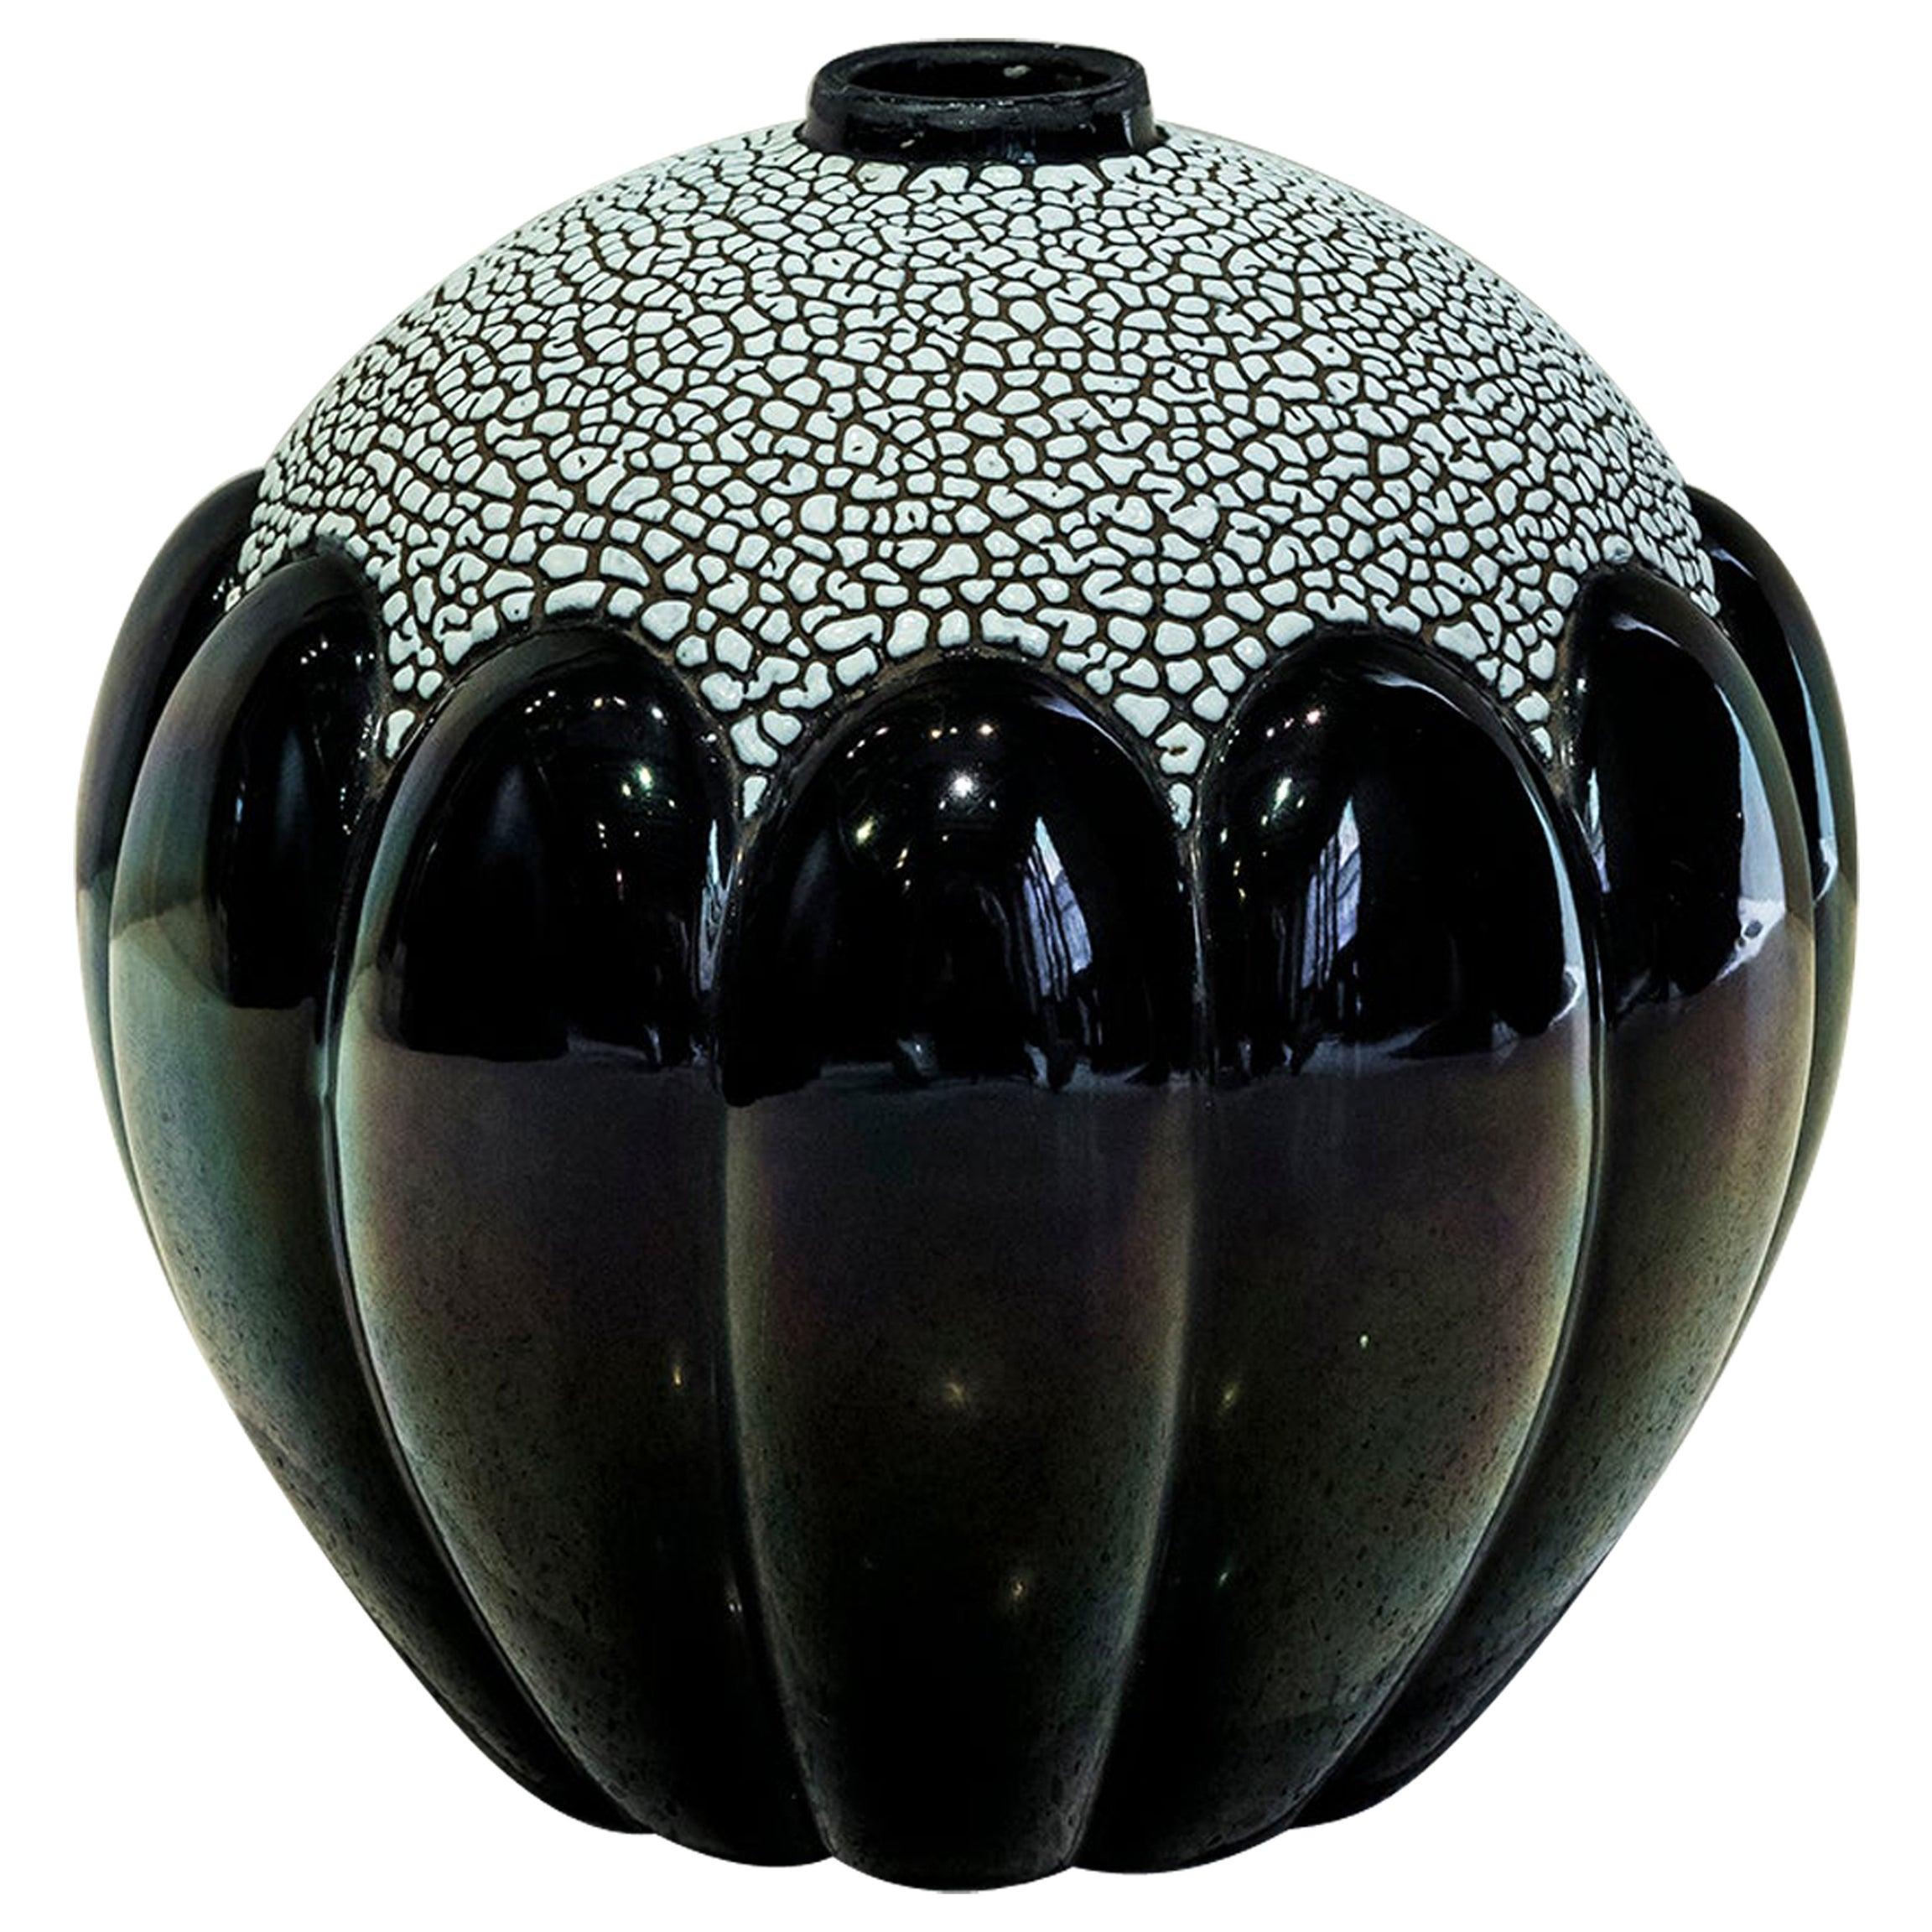 Enamel Ceramic Flower Vase Signed Saint Clement, France, circa 1930